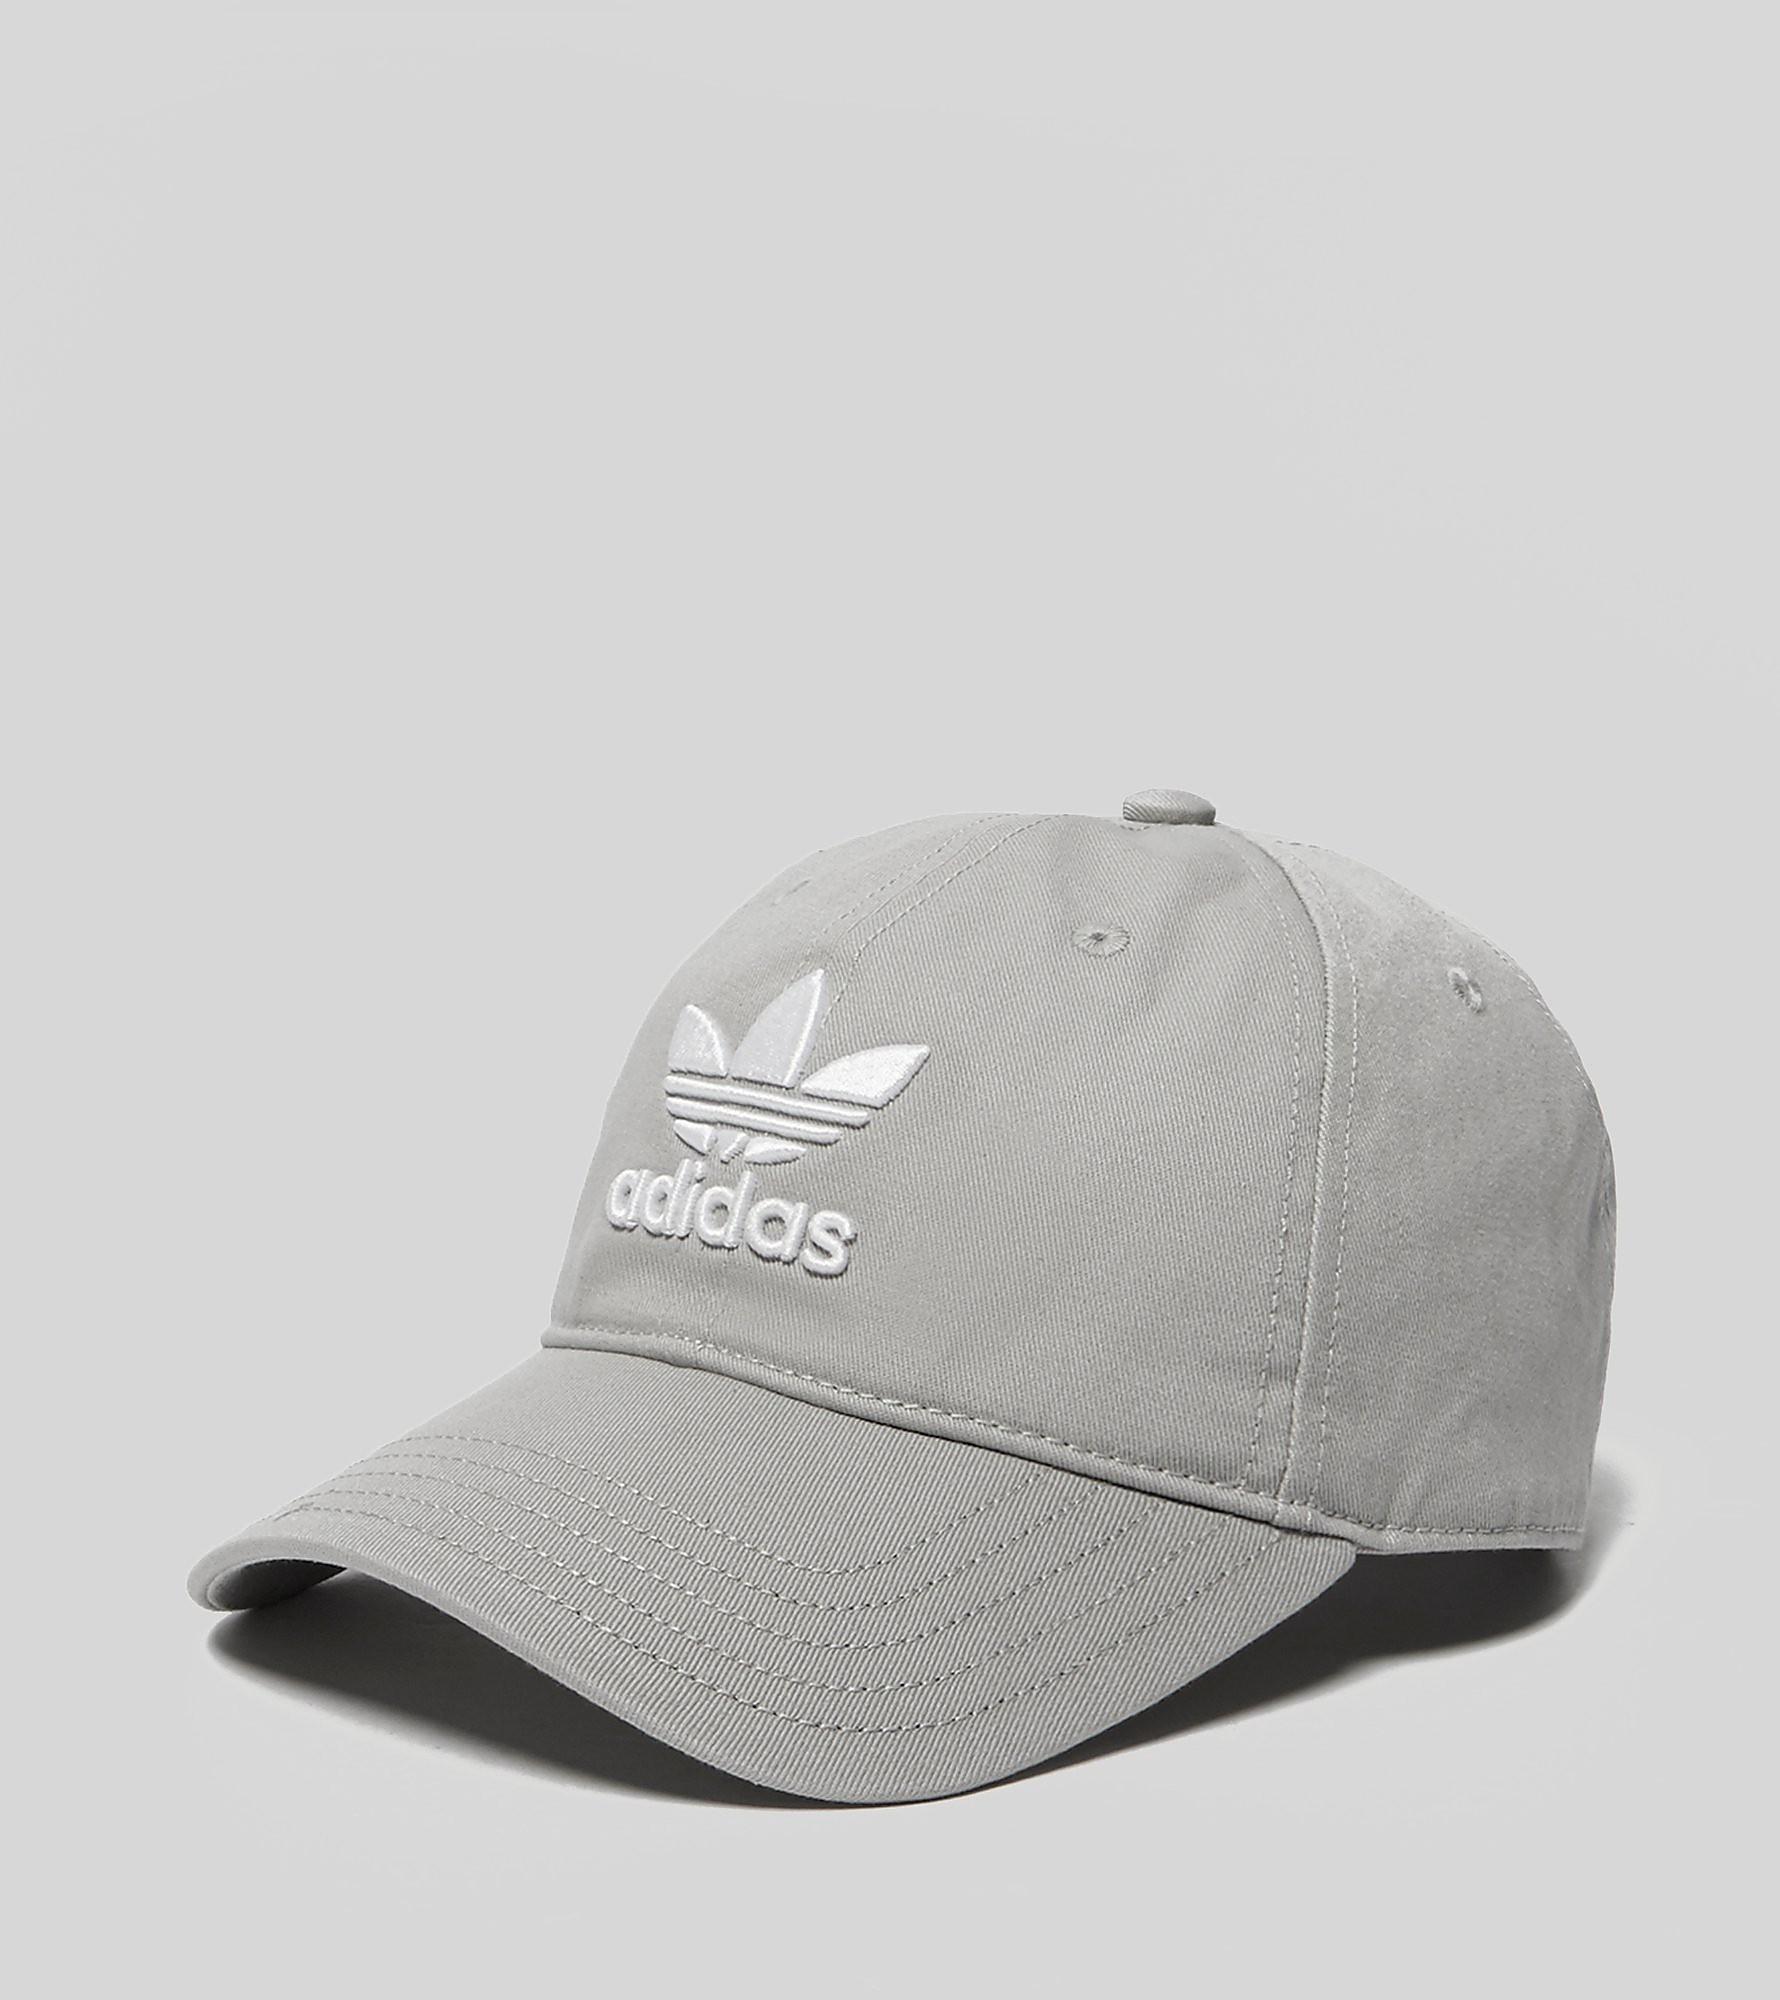 adidas Originals Trefoil Strapback Cap, Grey